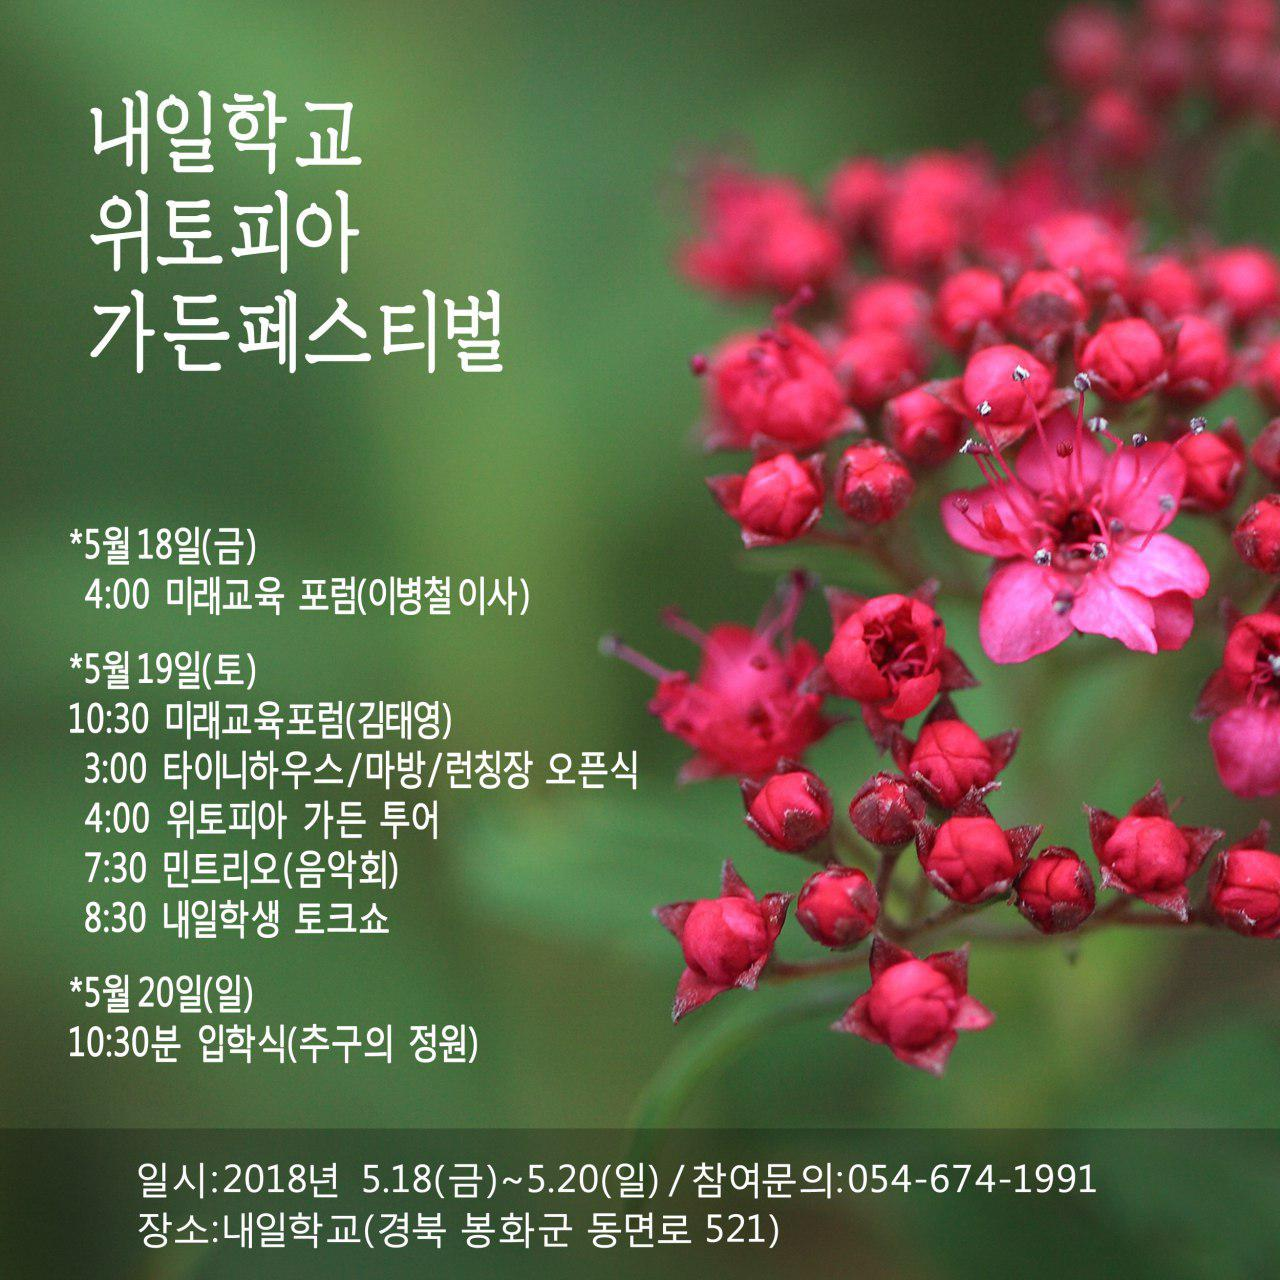 photo_2018-05-08_10-34-34.jpg